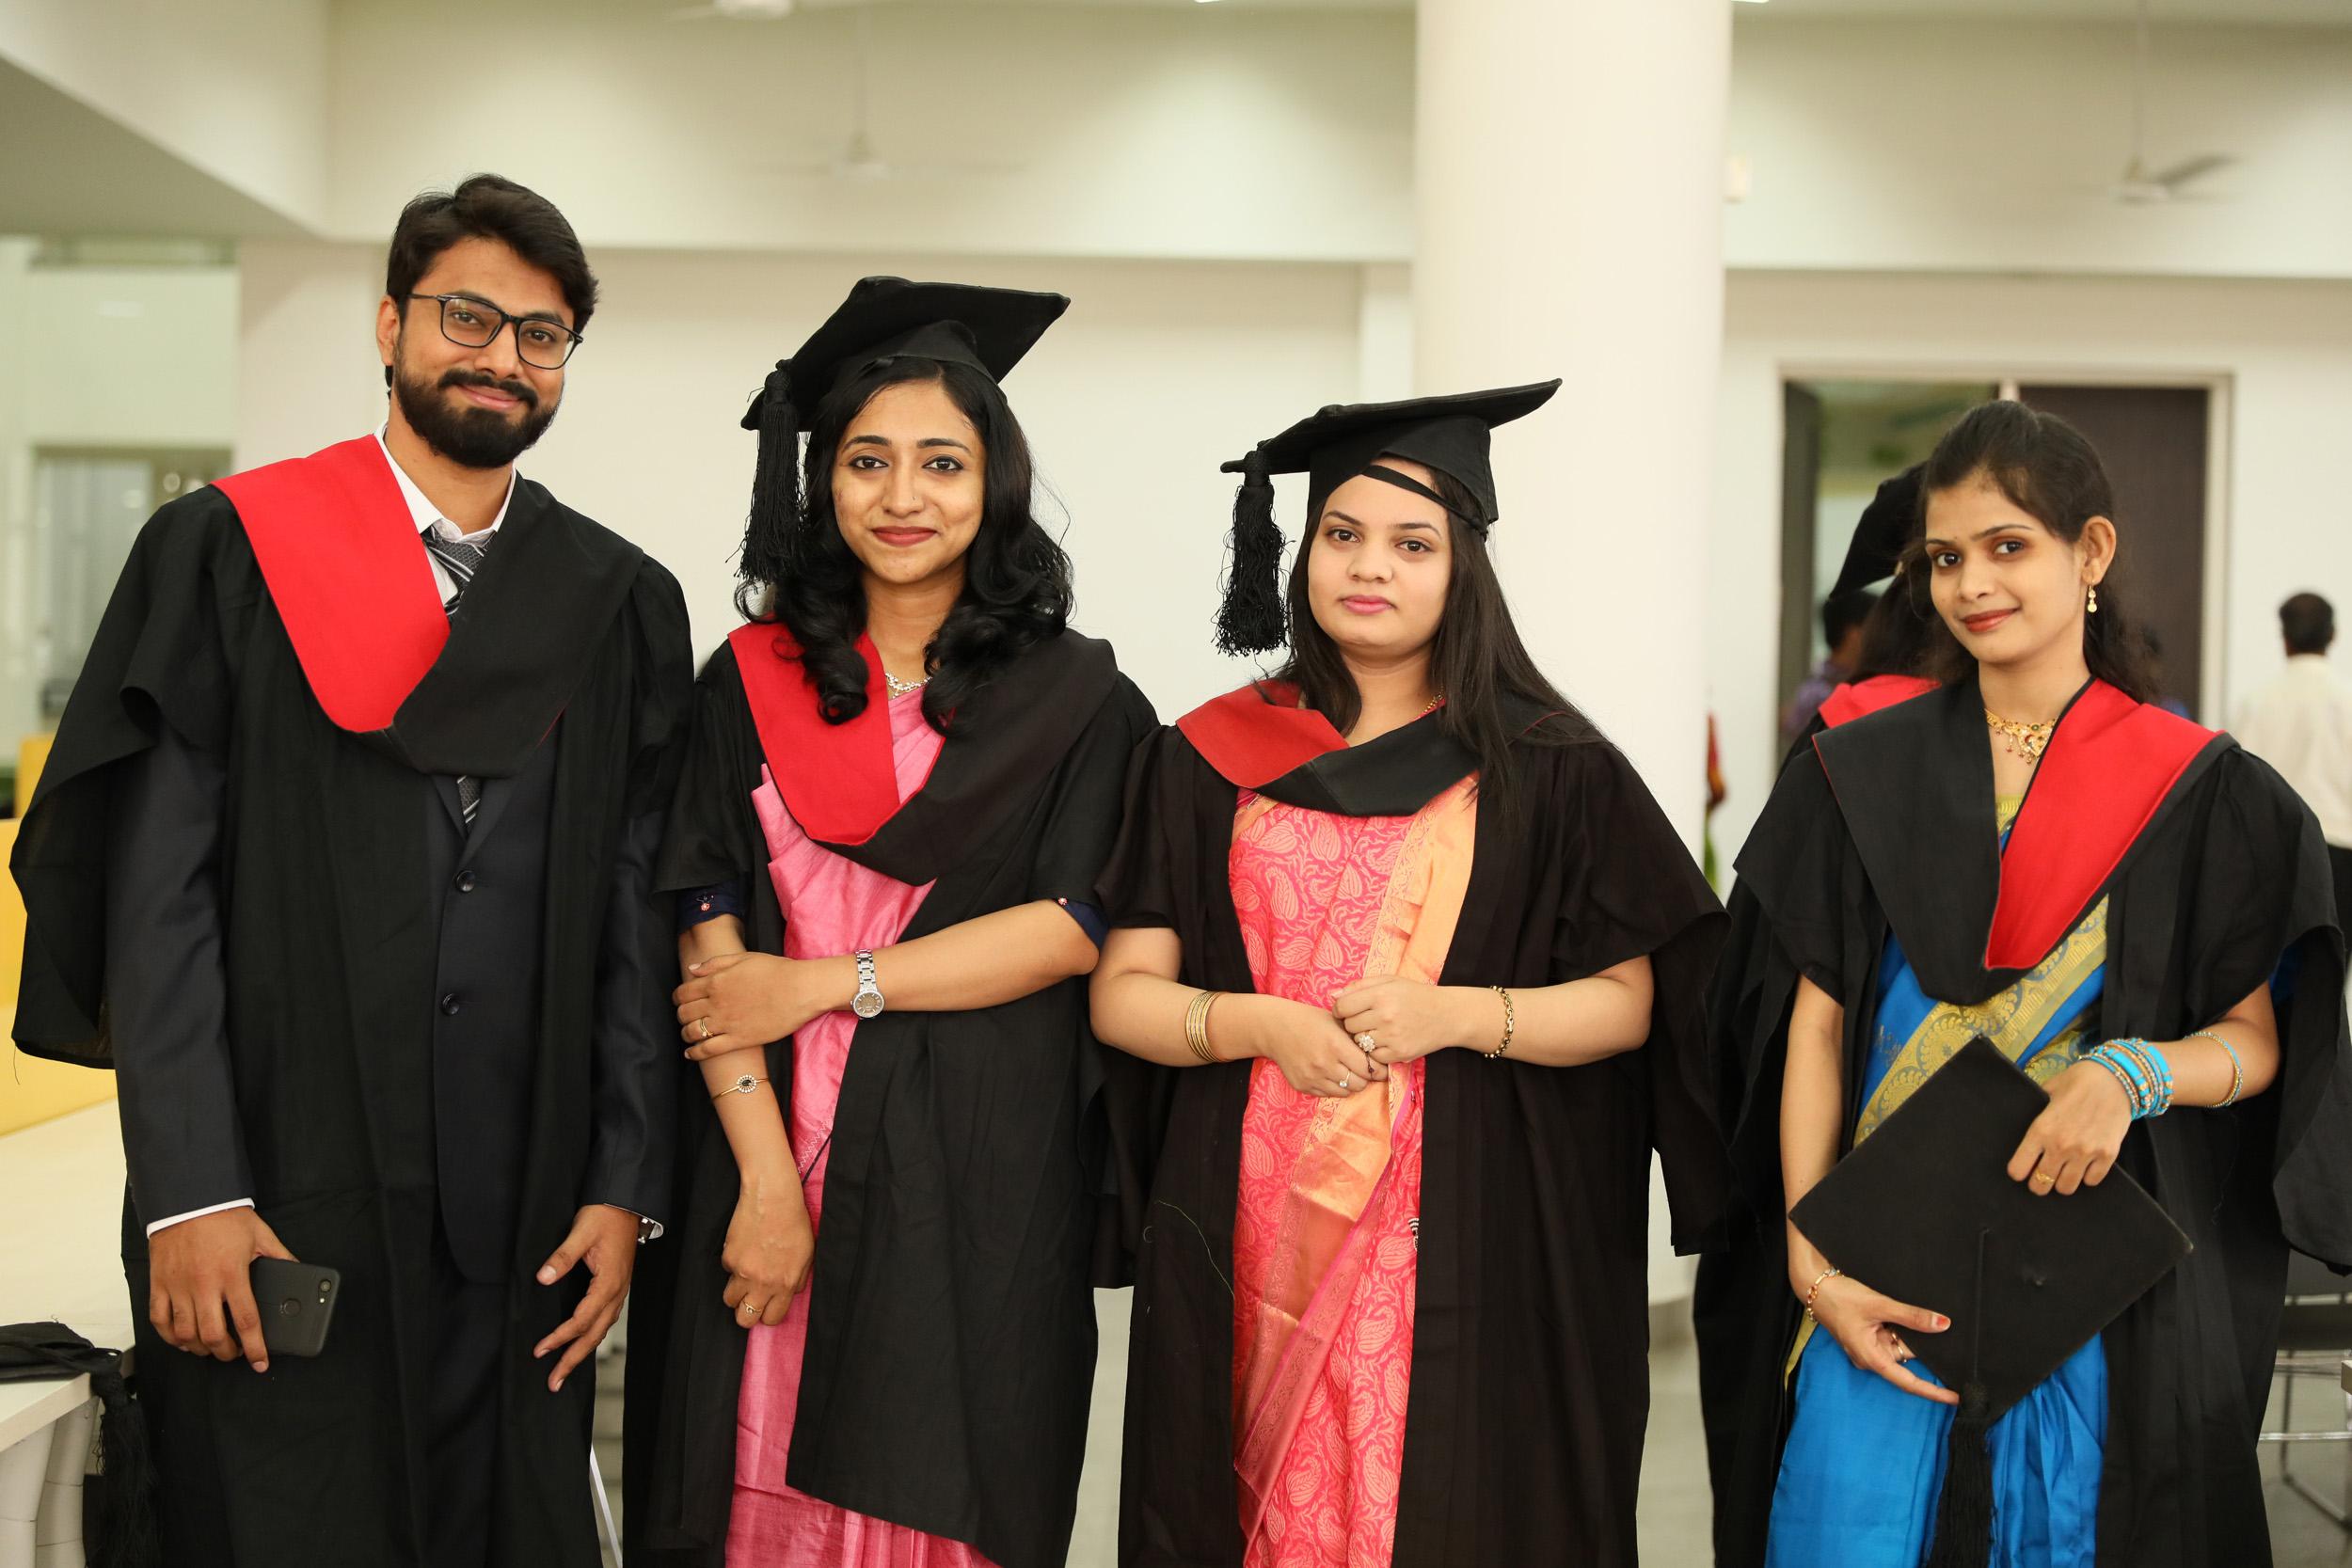 Graduation 2k18